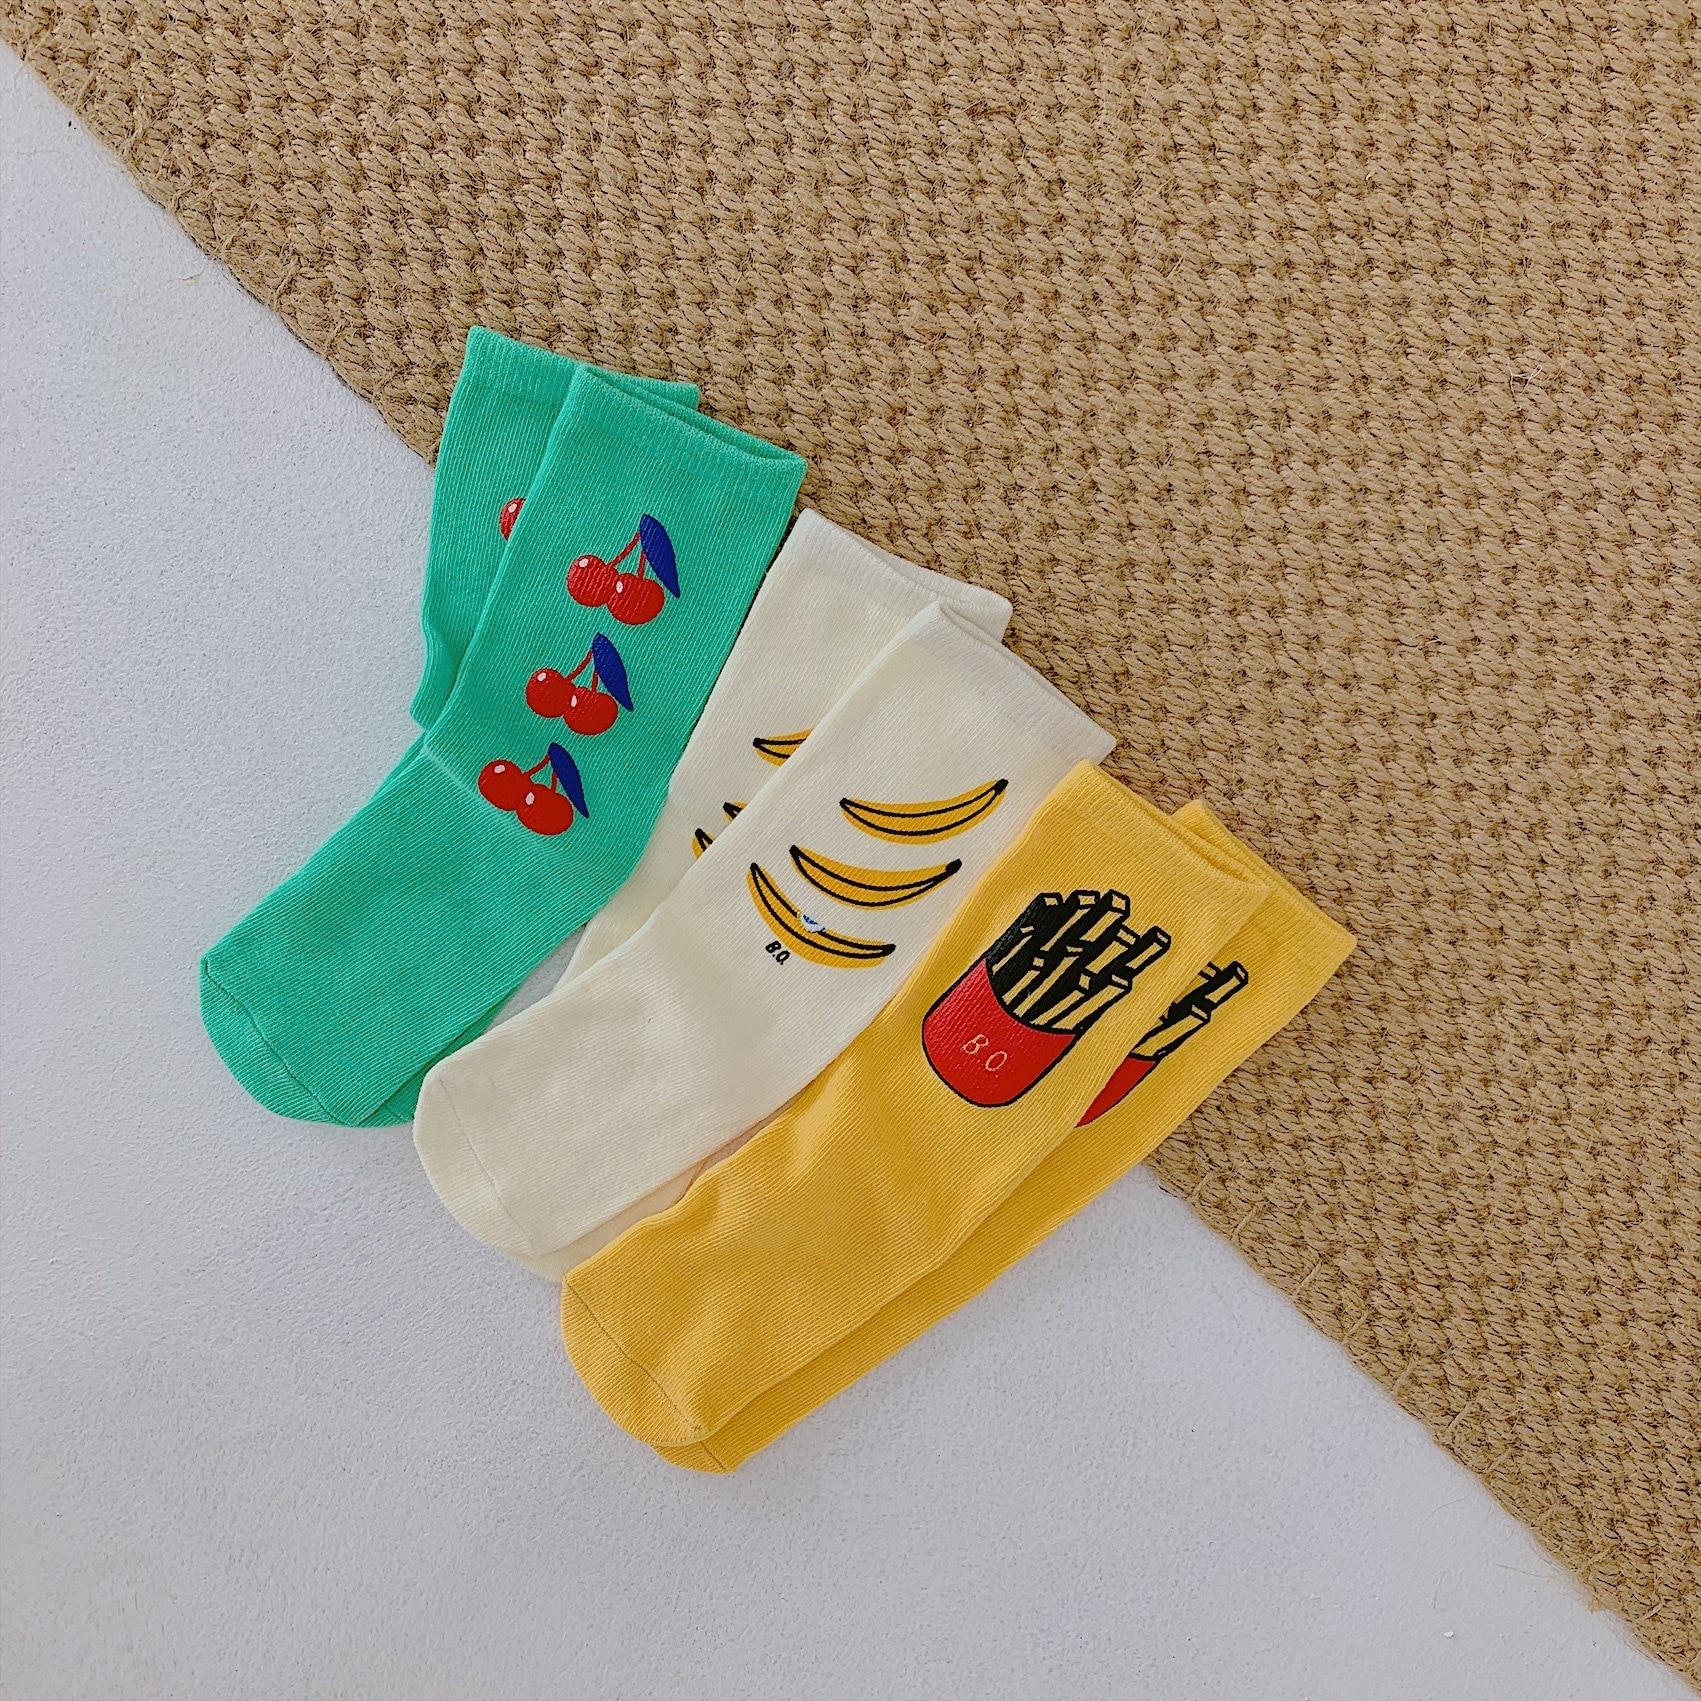 Children Heelless Straight Cotton Socks Boy Girl Cherry Banana Fries Print Knee-highs Fashion Free Size Socks for Kids Boys Girl(China)